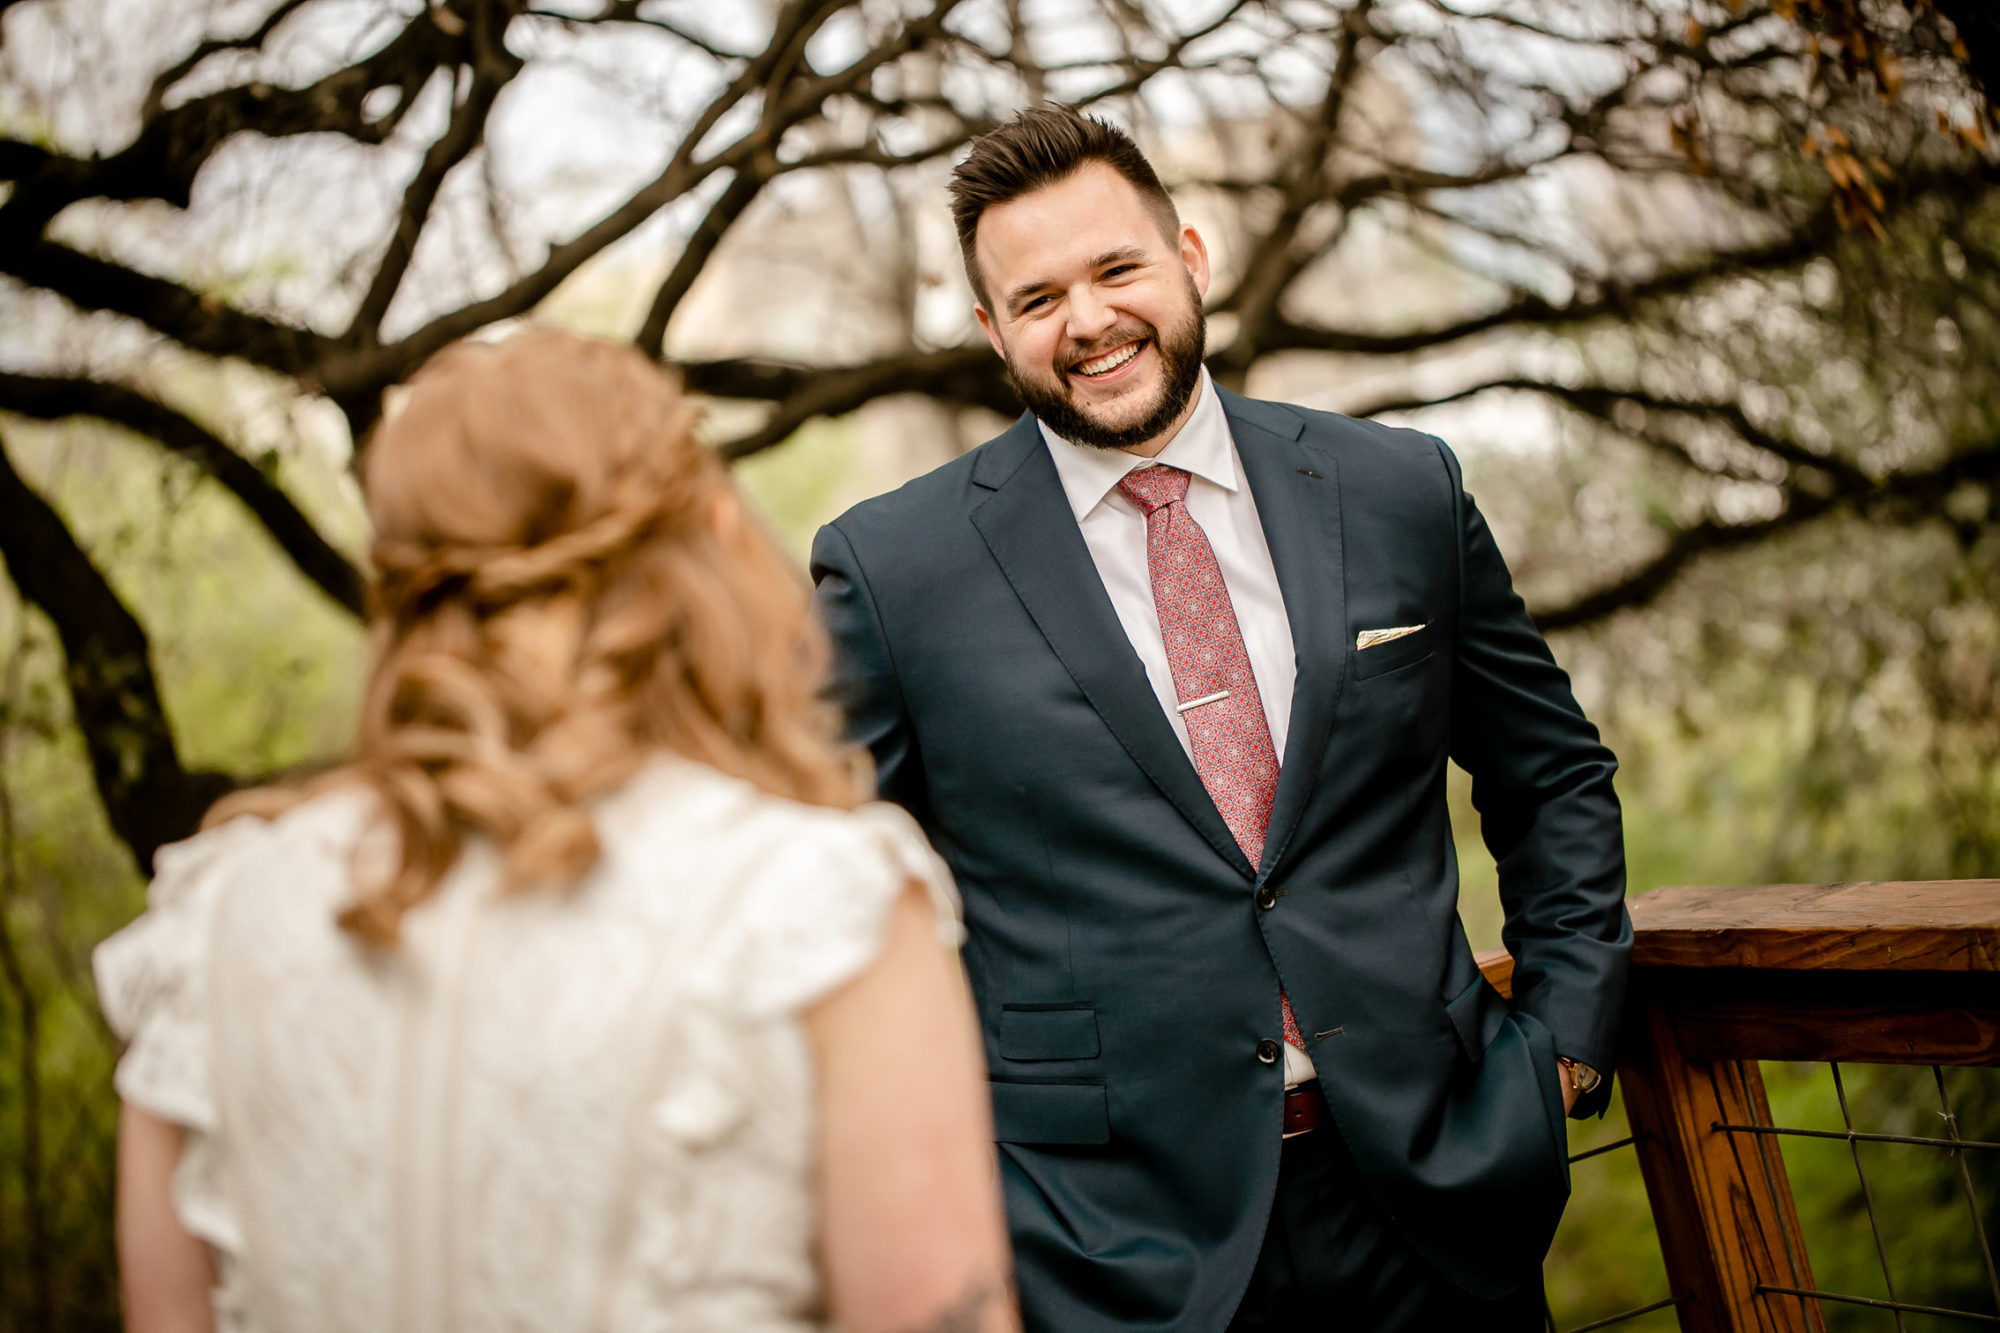 wedding First look benefits